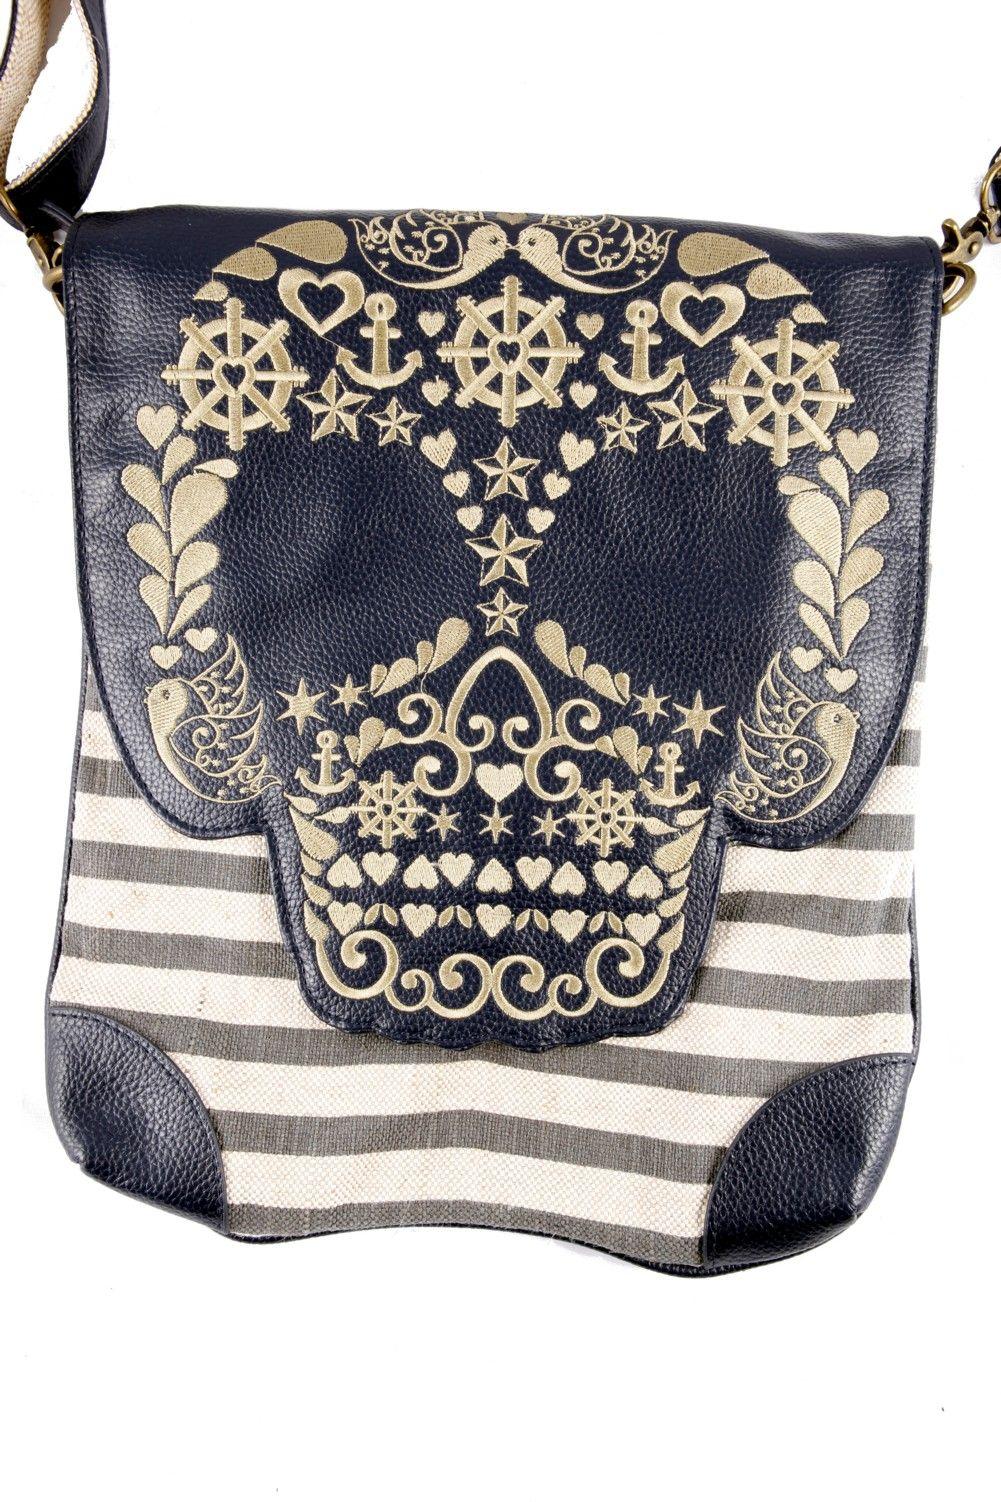 Loungefly Cross Body Bag in the Gold Skull Stripe Nautical Sugar Skull